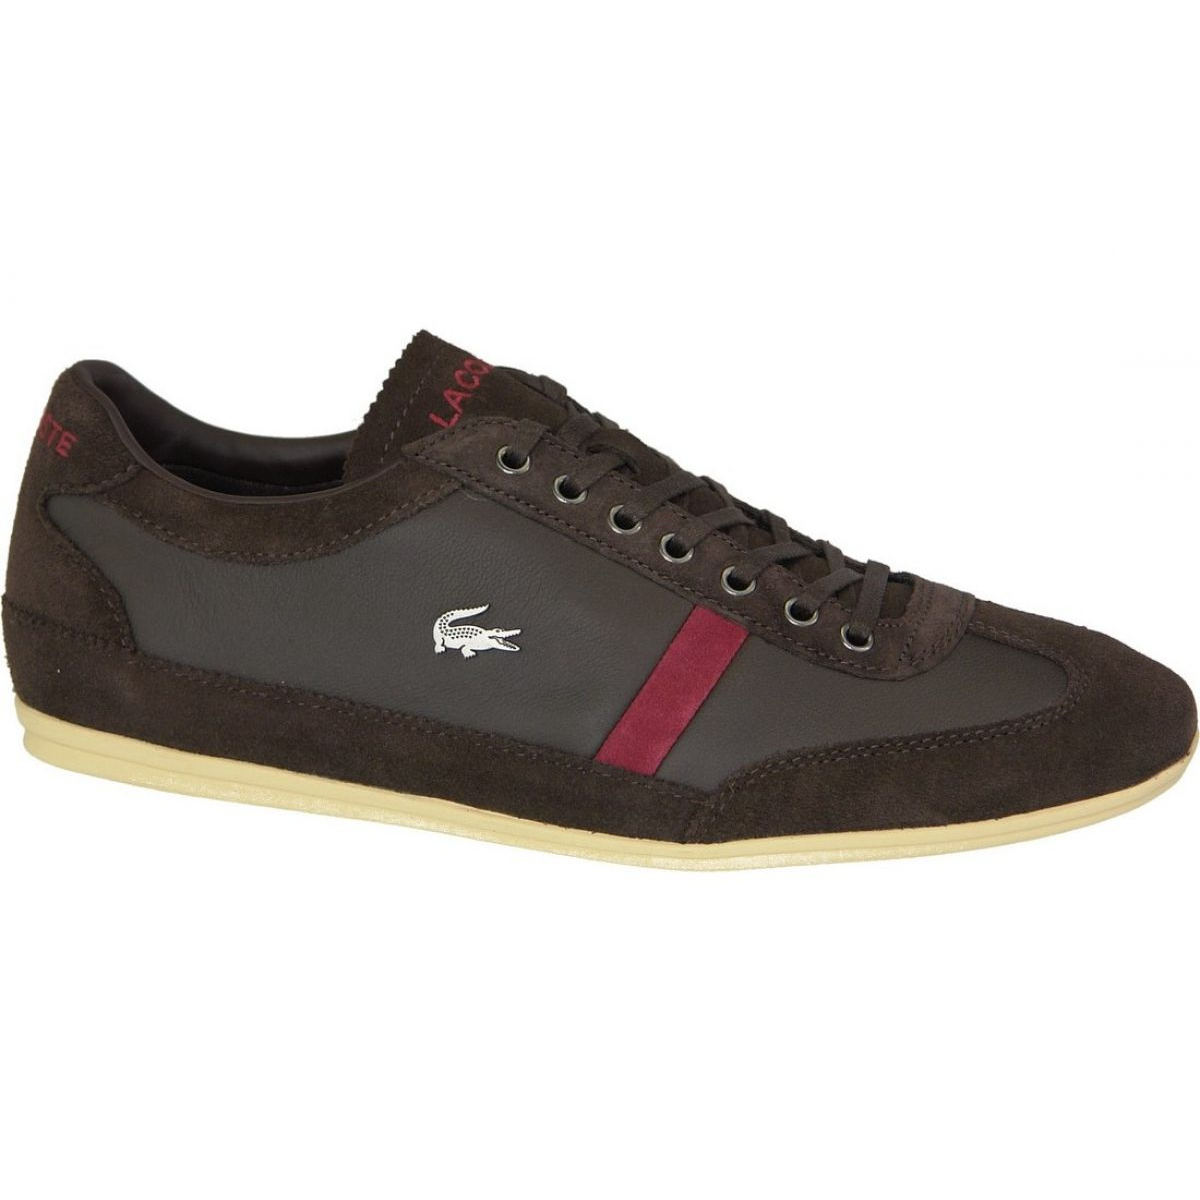 Lacoste-Misano-22-Lcr-M-SRM2146176-shoes-brown